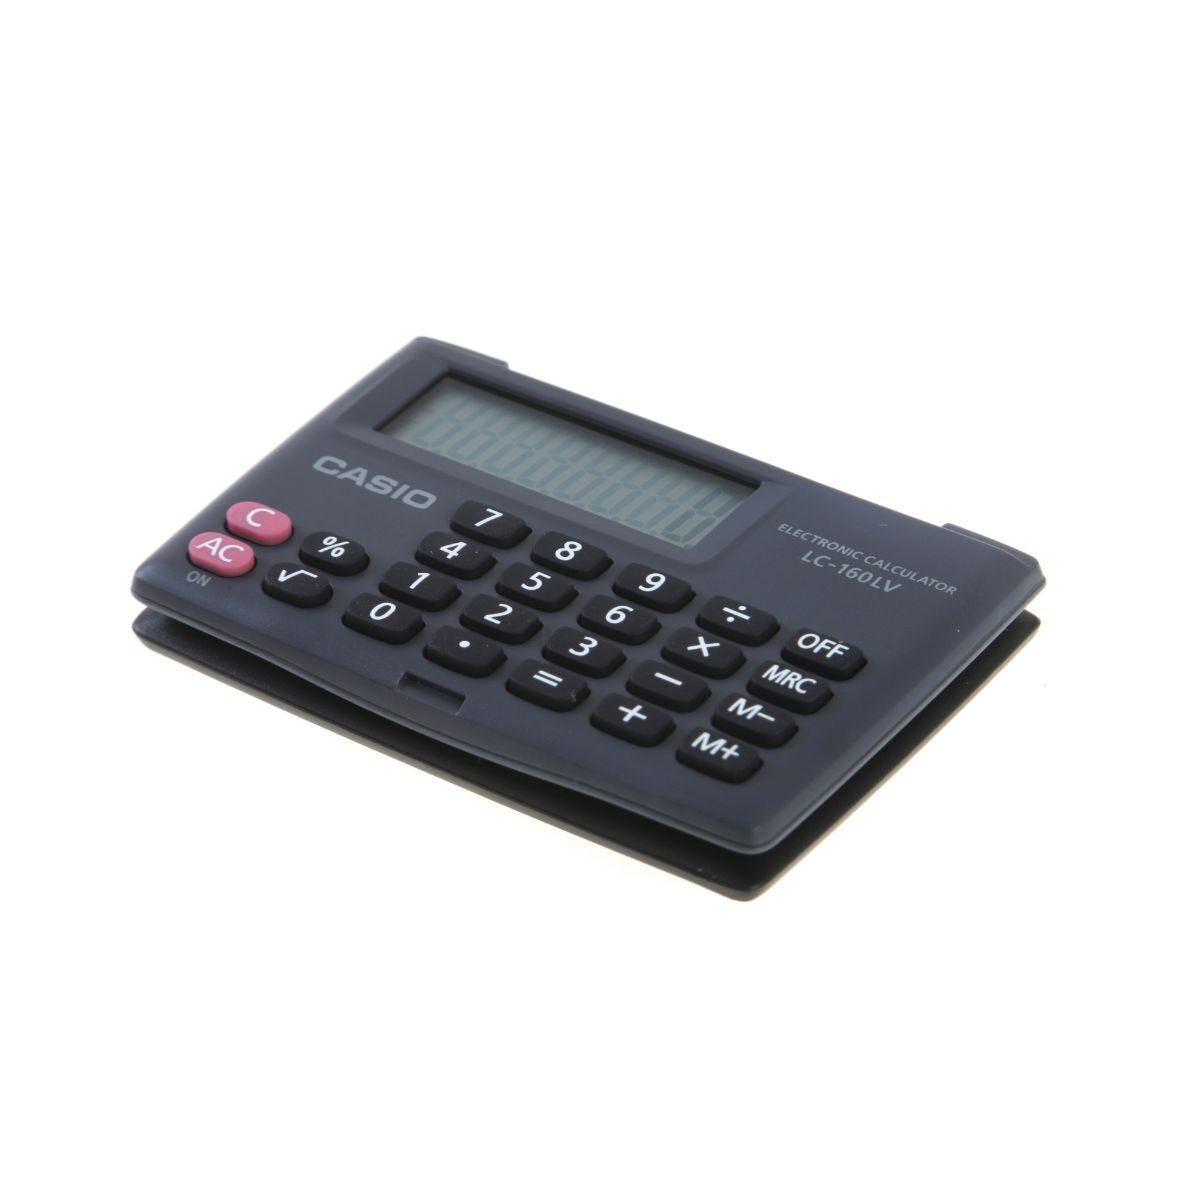 Casio LC-160LV Pocket Calculator